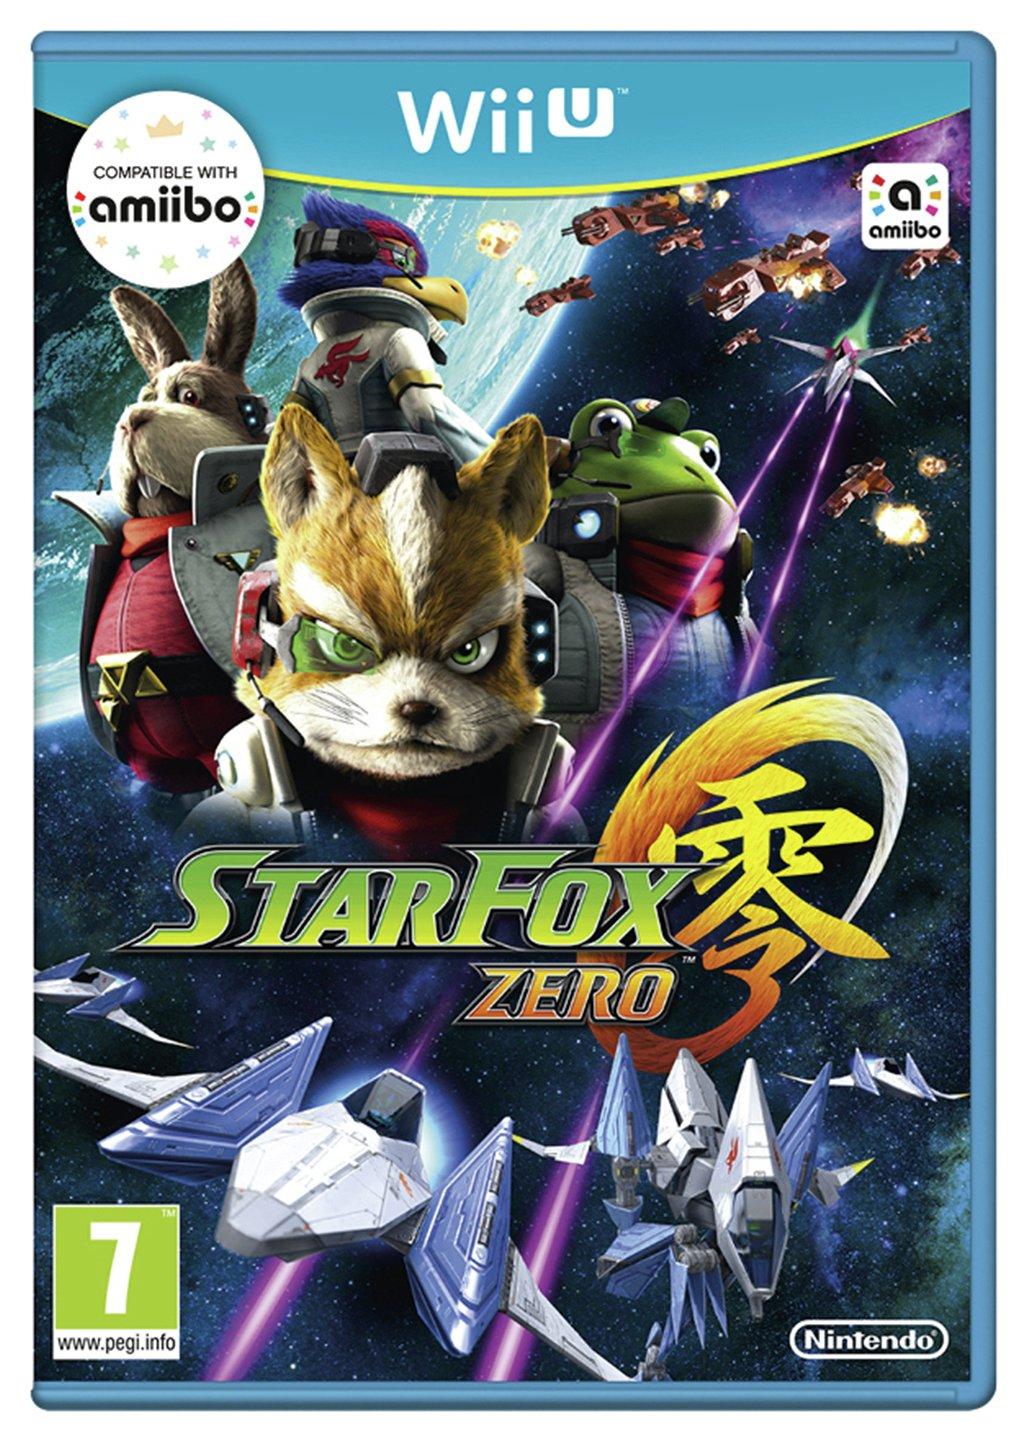 Nintendo Starfox Zero - Wii U Game